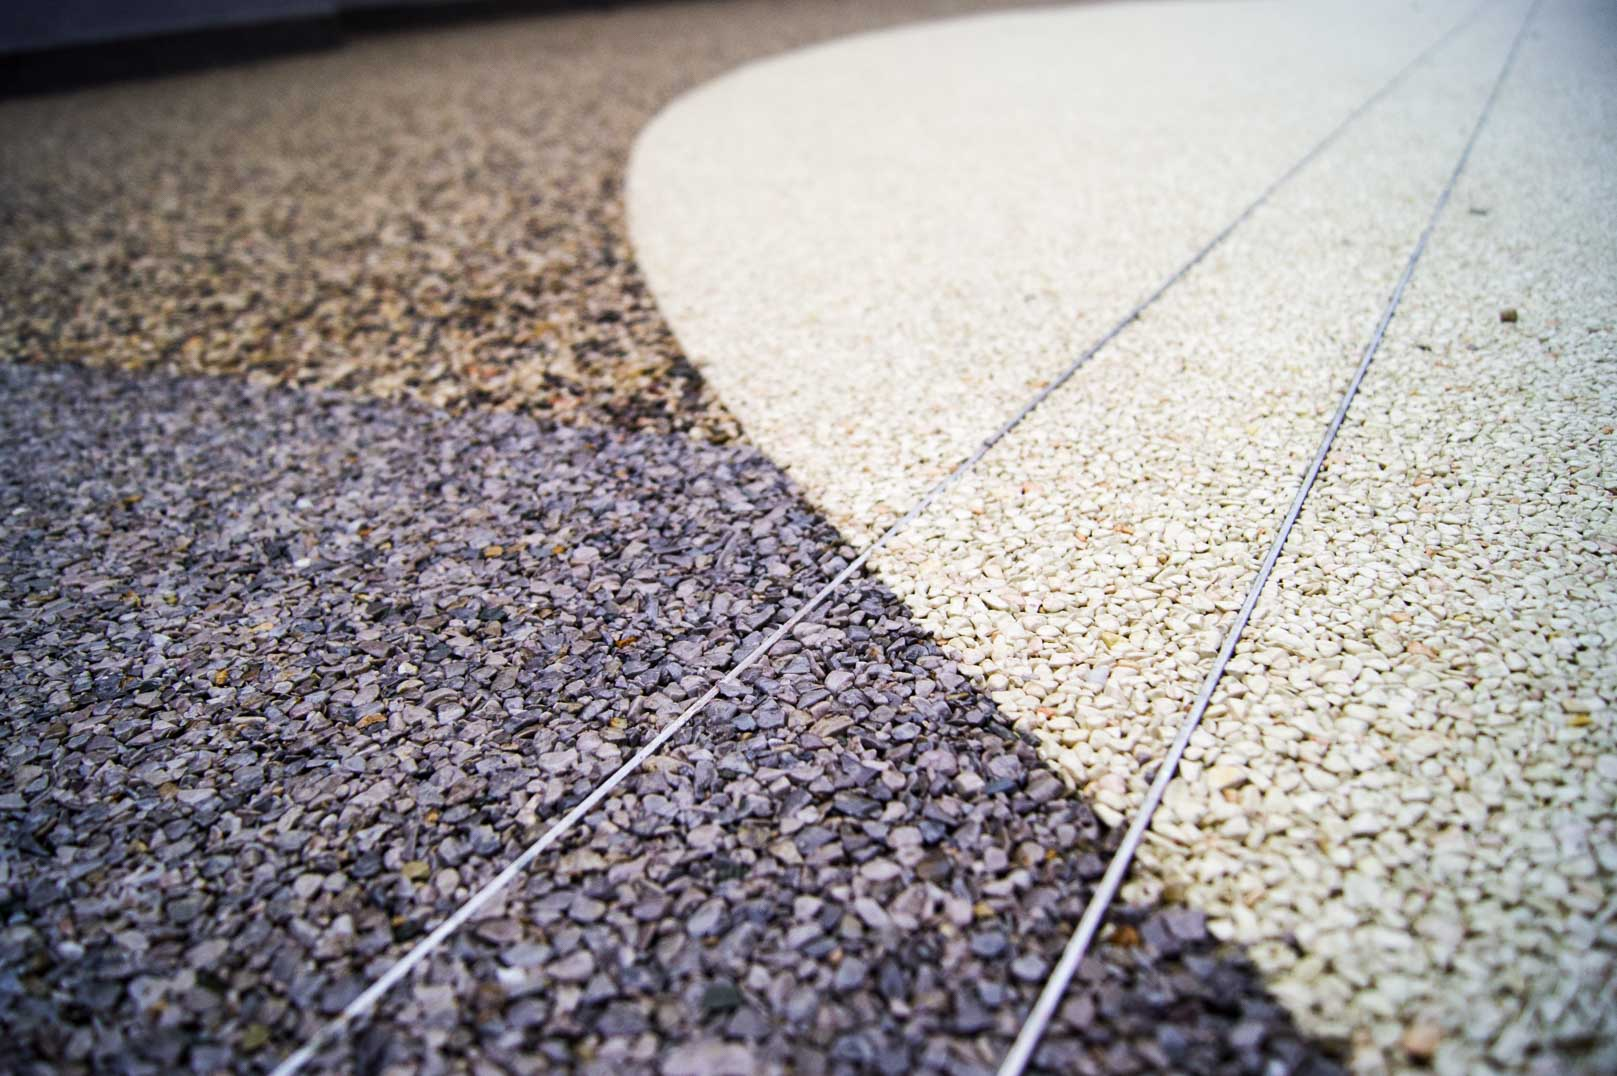 viarustik-stone-carpet